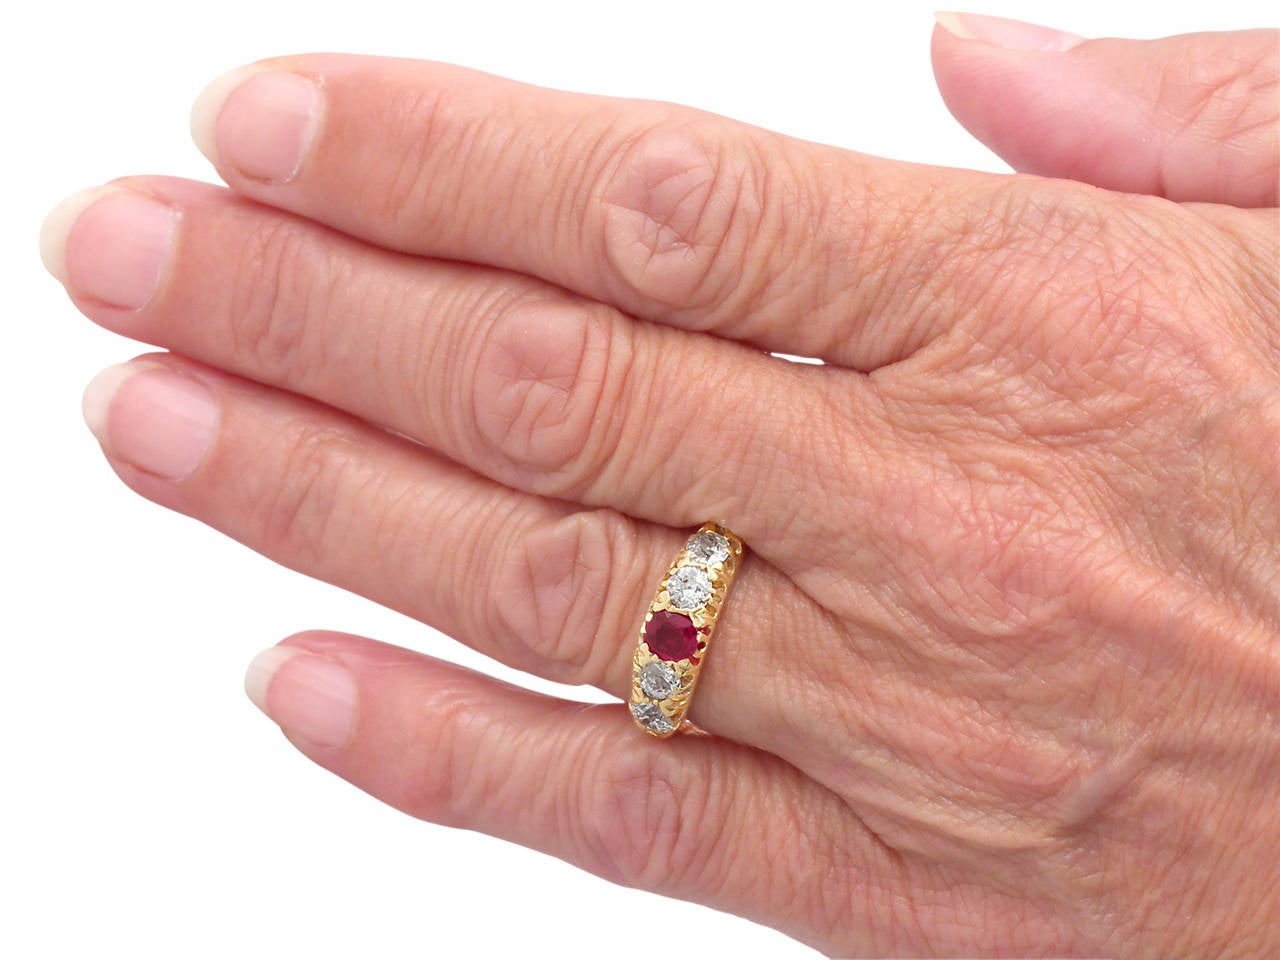 Synthetic Diamond Bracelet - Ivoiregion